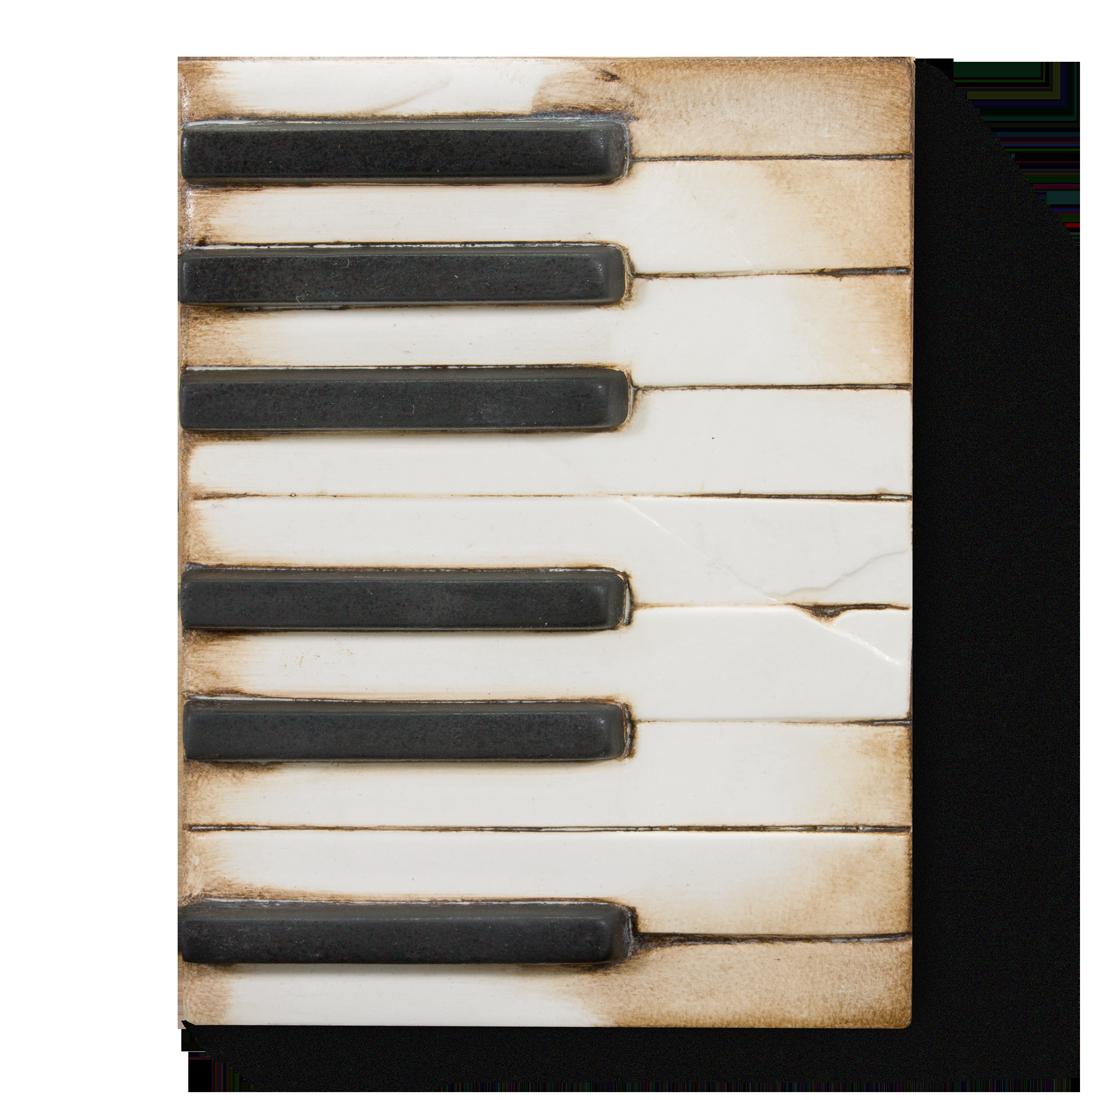 Piano Keys by Sid Dickens